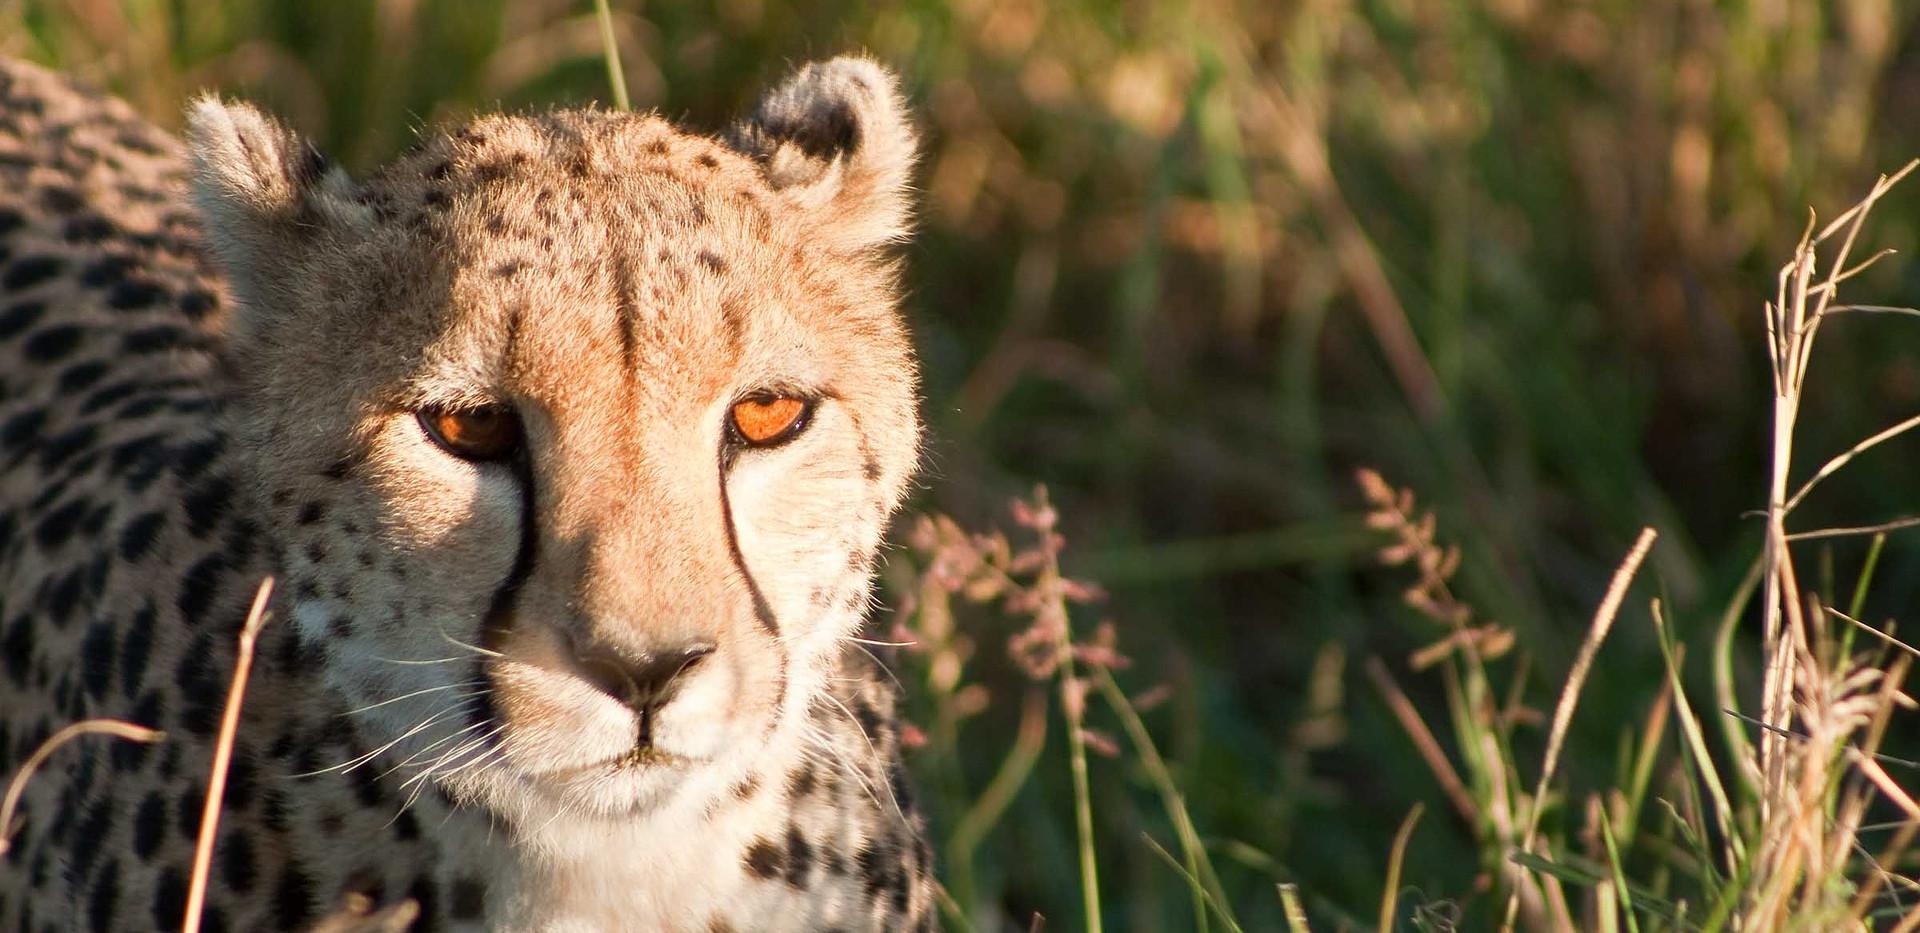 cheetah-1083274_1920.jpg